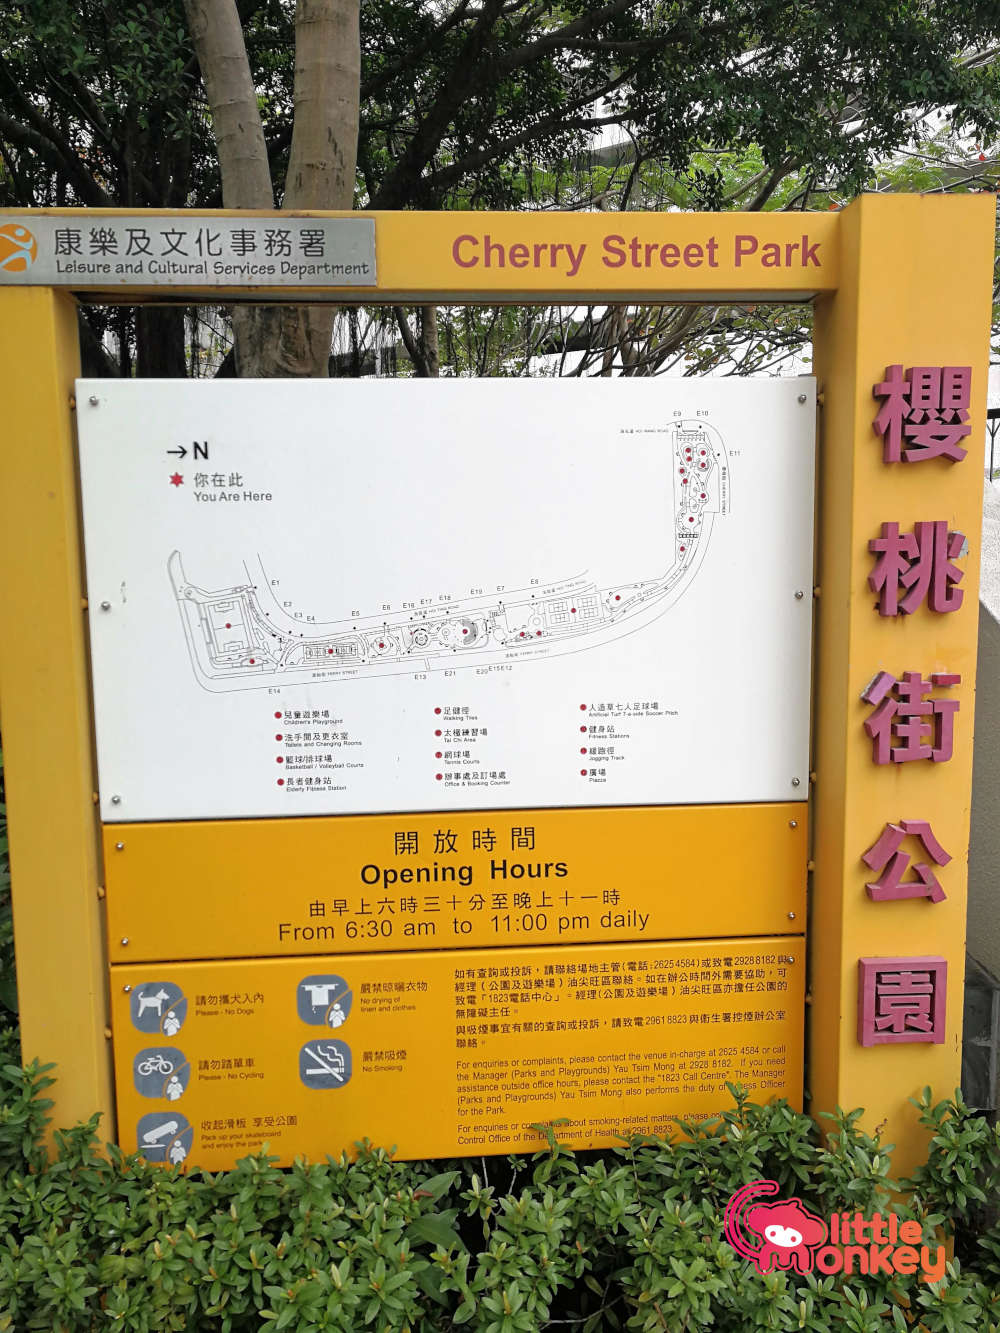 Cherry Street Park's Sign